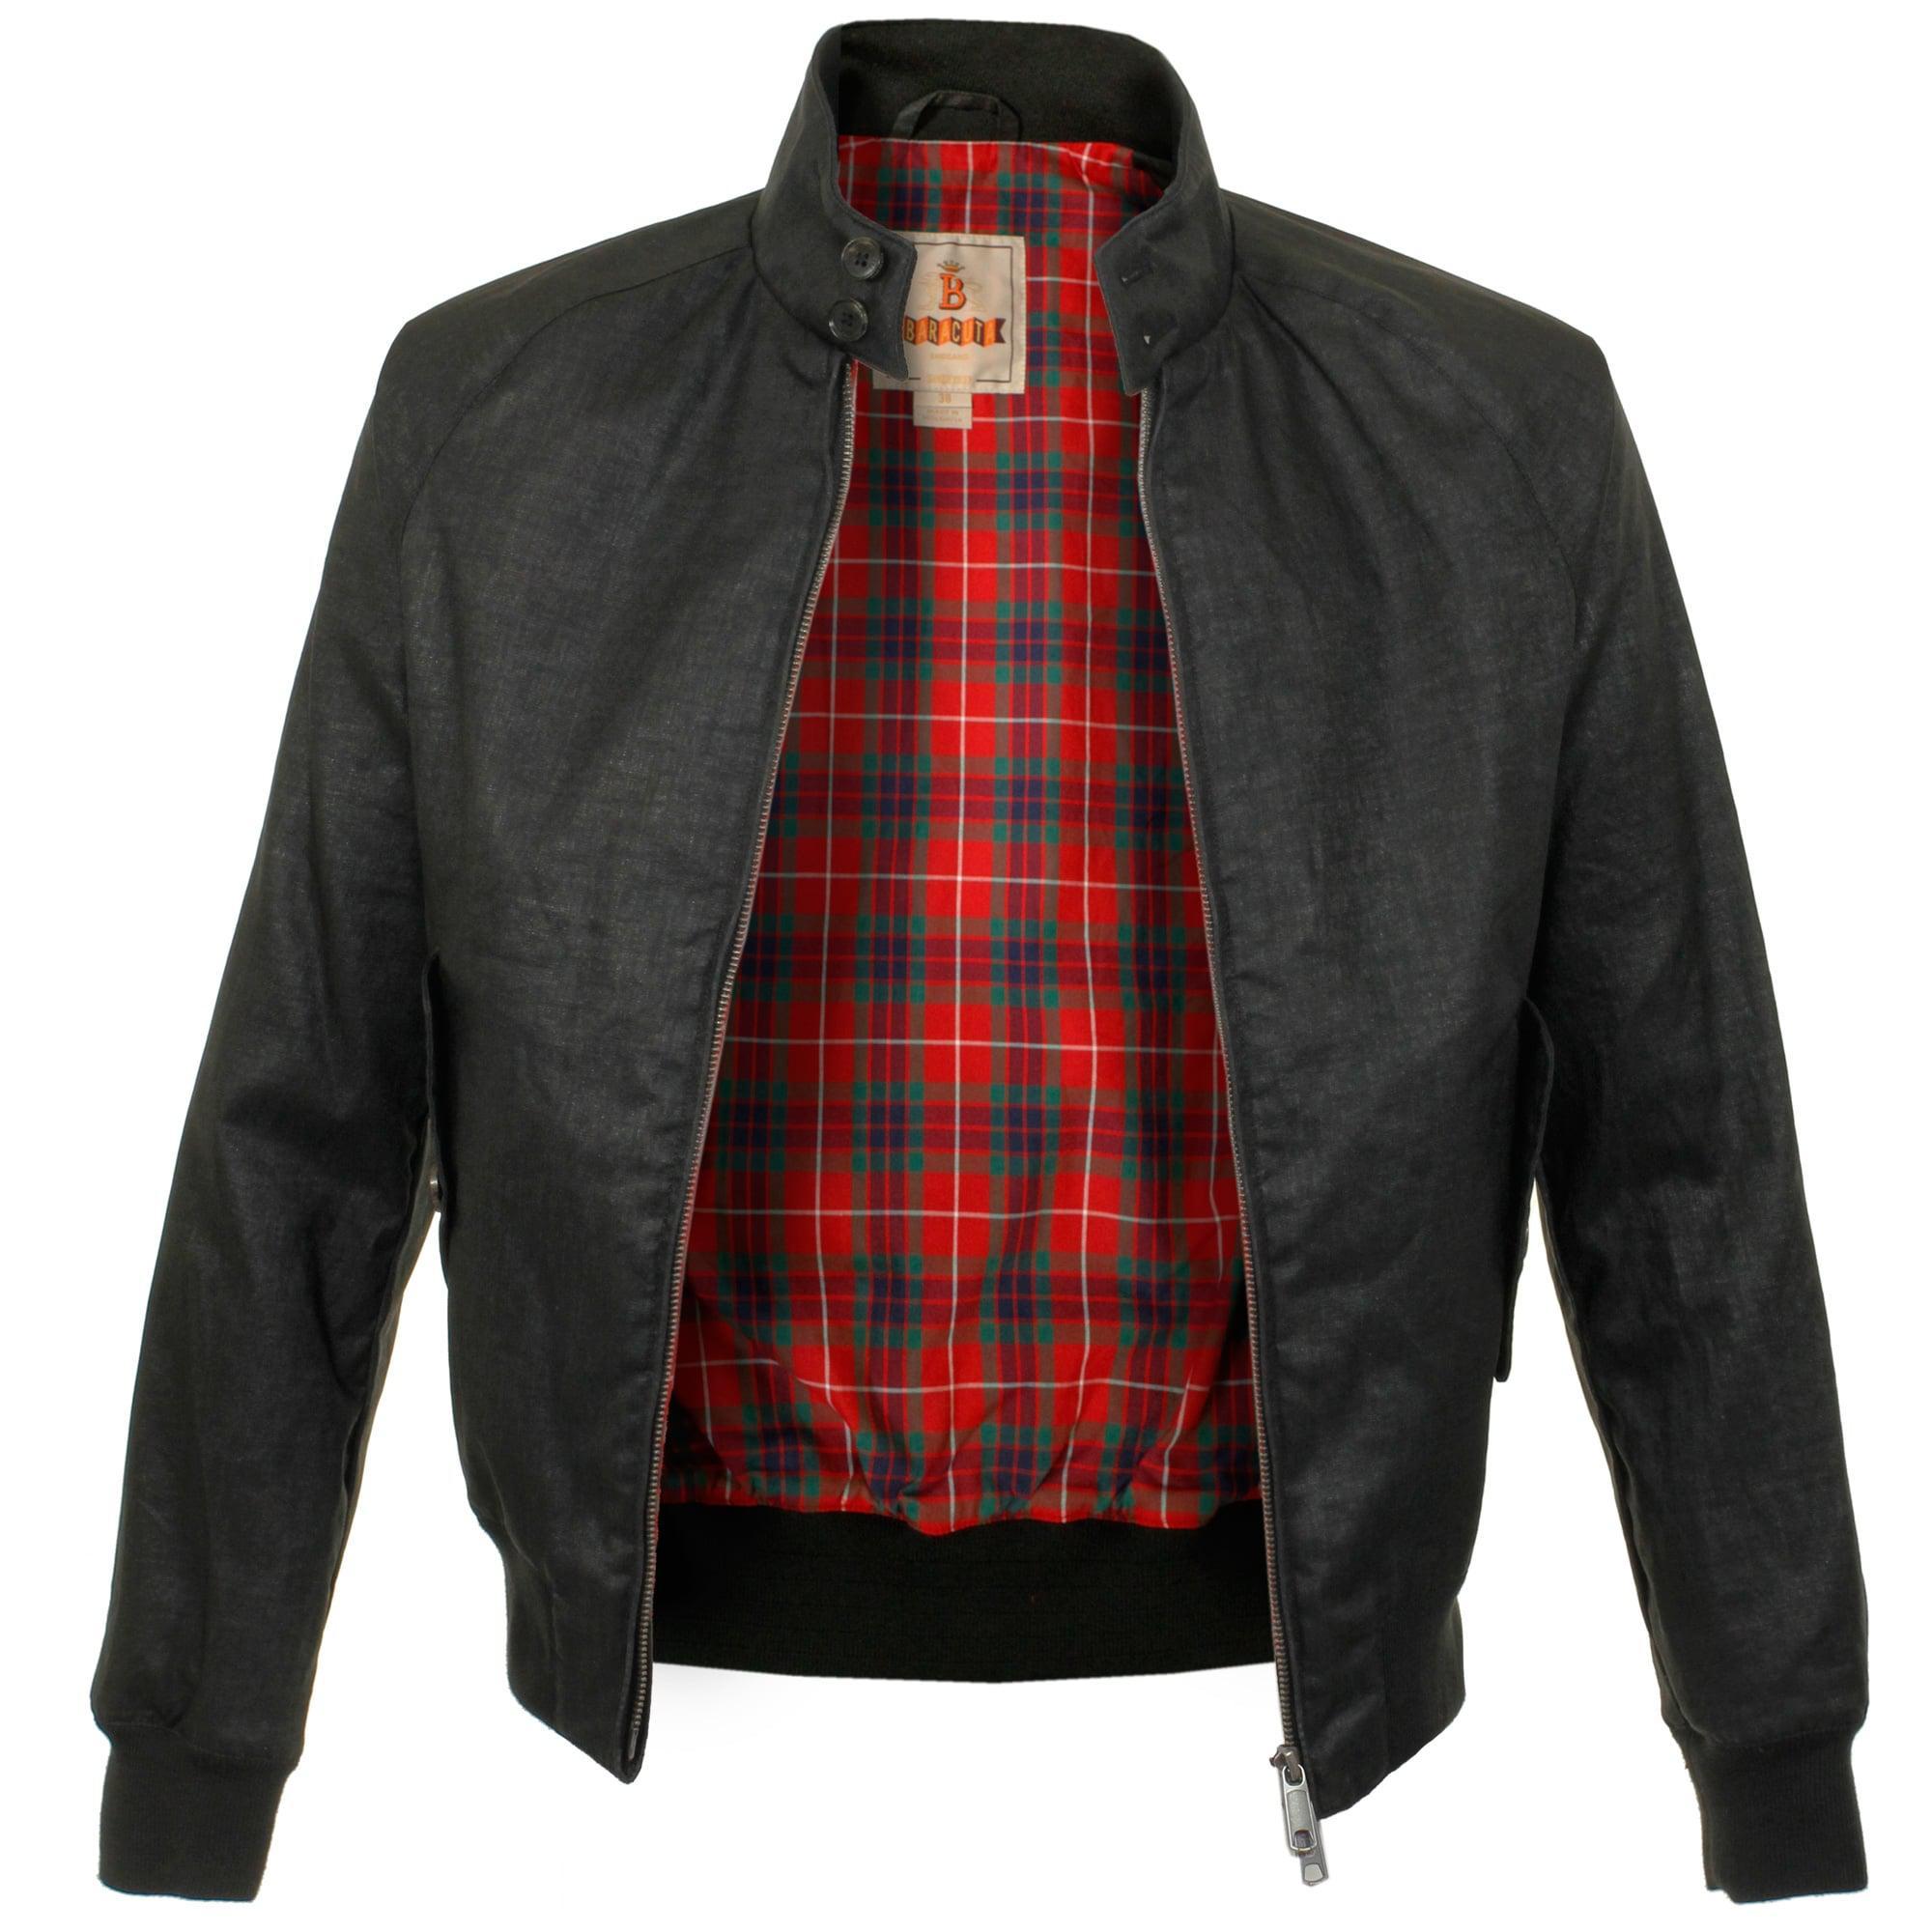 Baracuta G9 Linen Black Harrington Jacket for Men